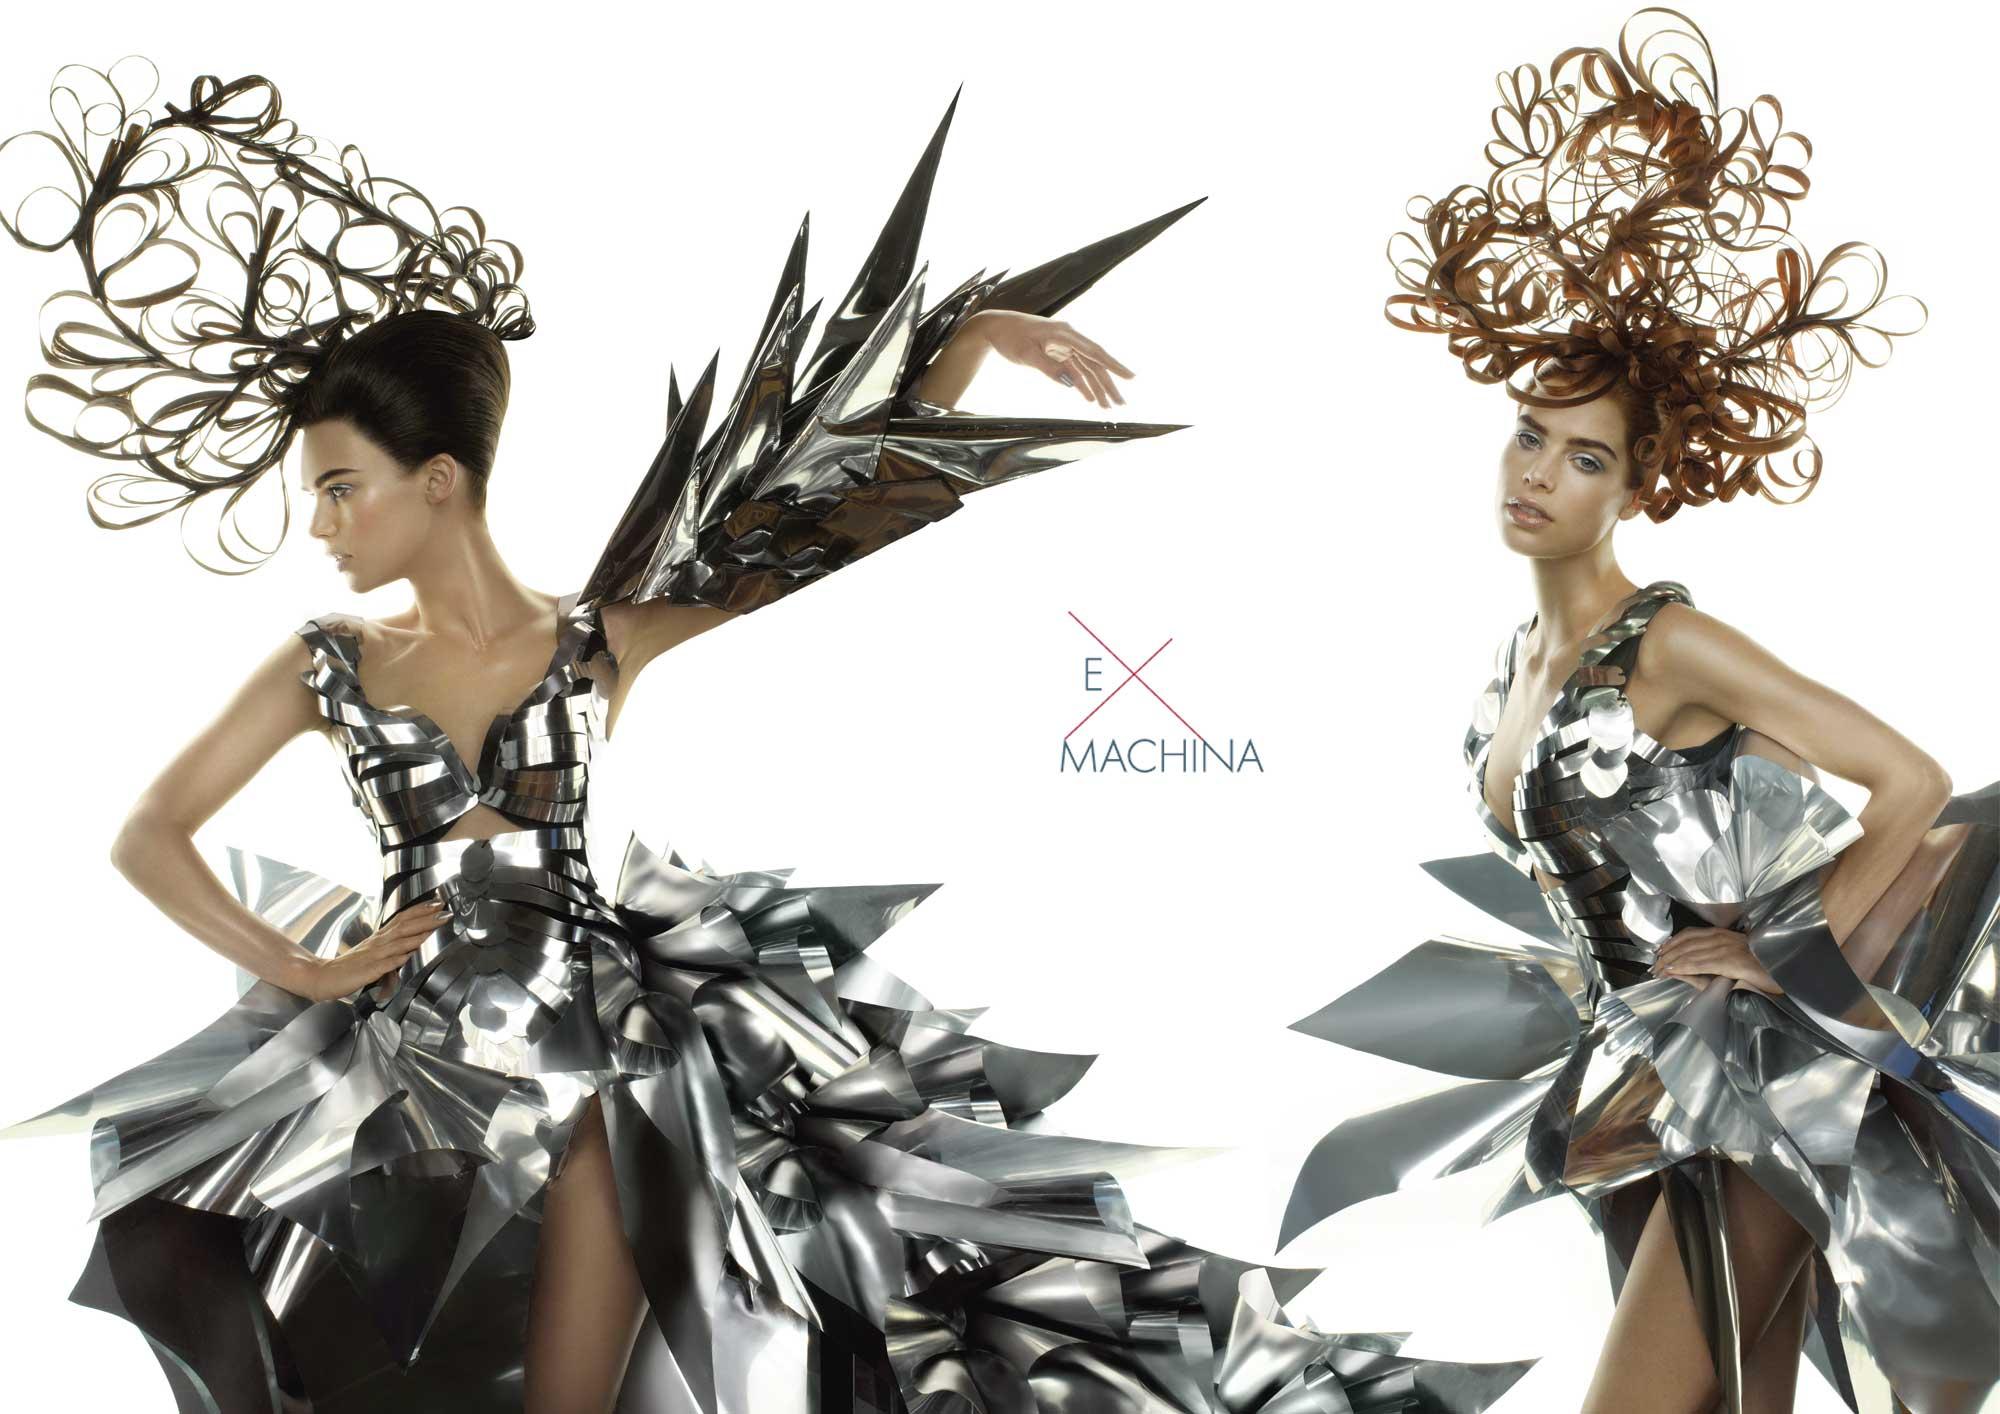 Hair: Chris Vandehey; Makeup: Wanda Alvarez; Fashion: Rocky Gathercole. Photography by Luis Alvarez for Aquage